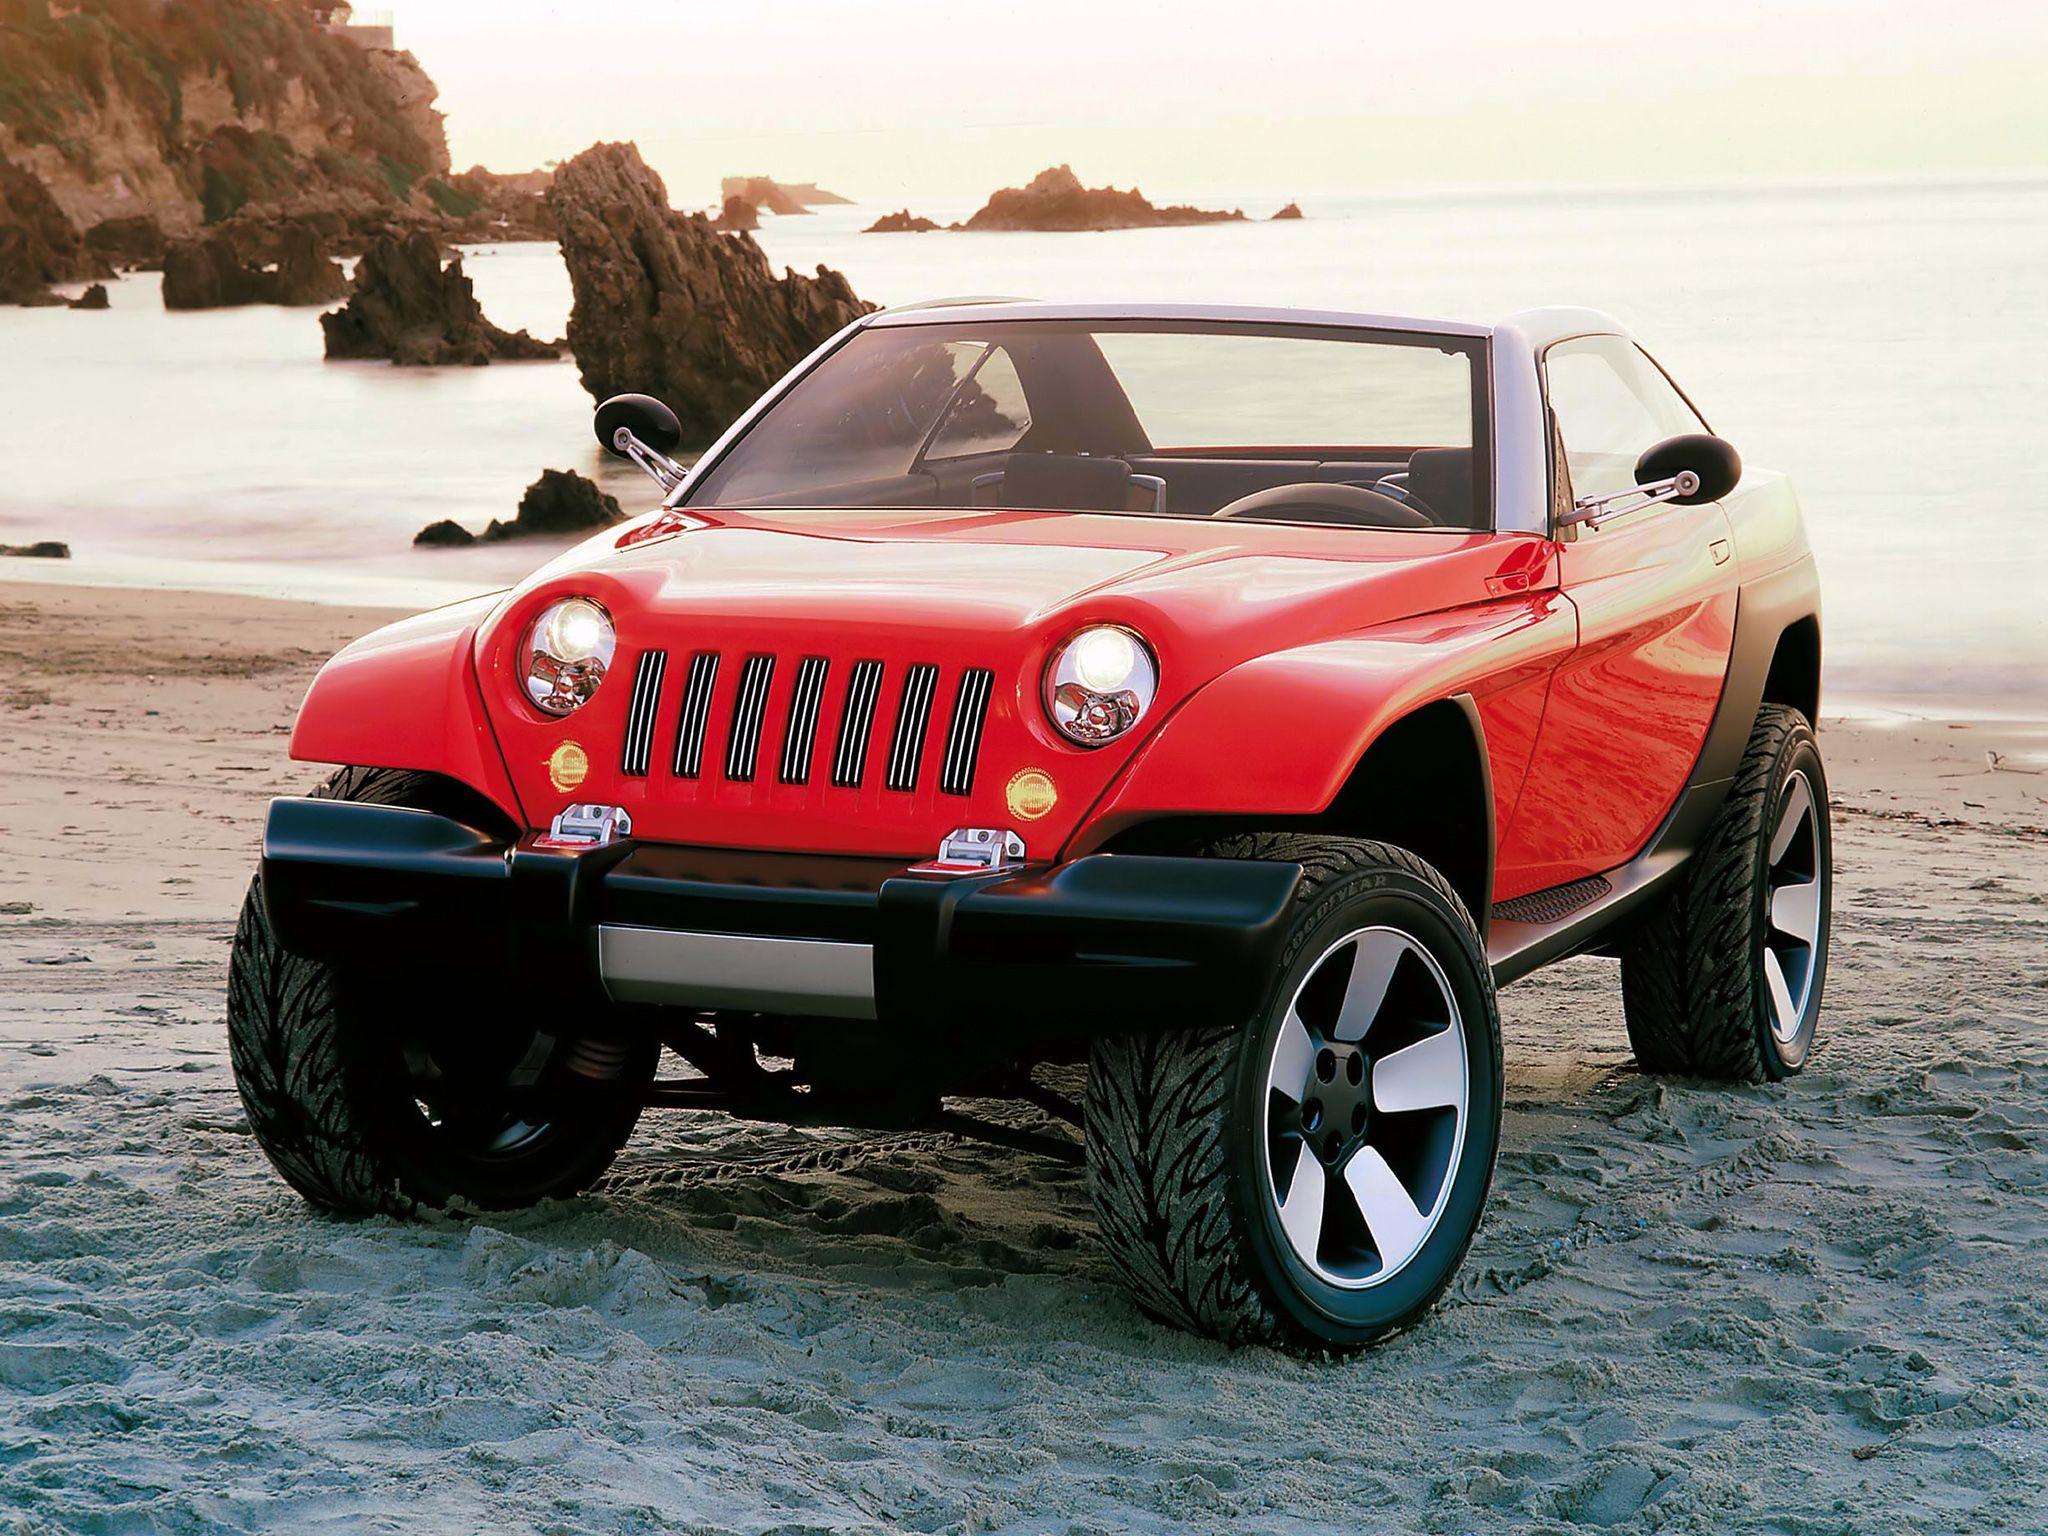 1998 Jeep Jeepster Concept Jeep Concept Jeepster Concept Cars